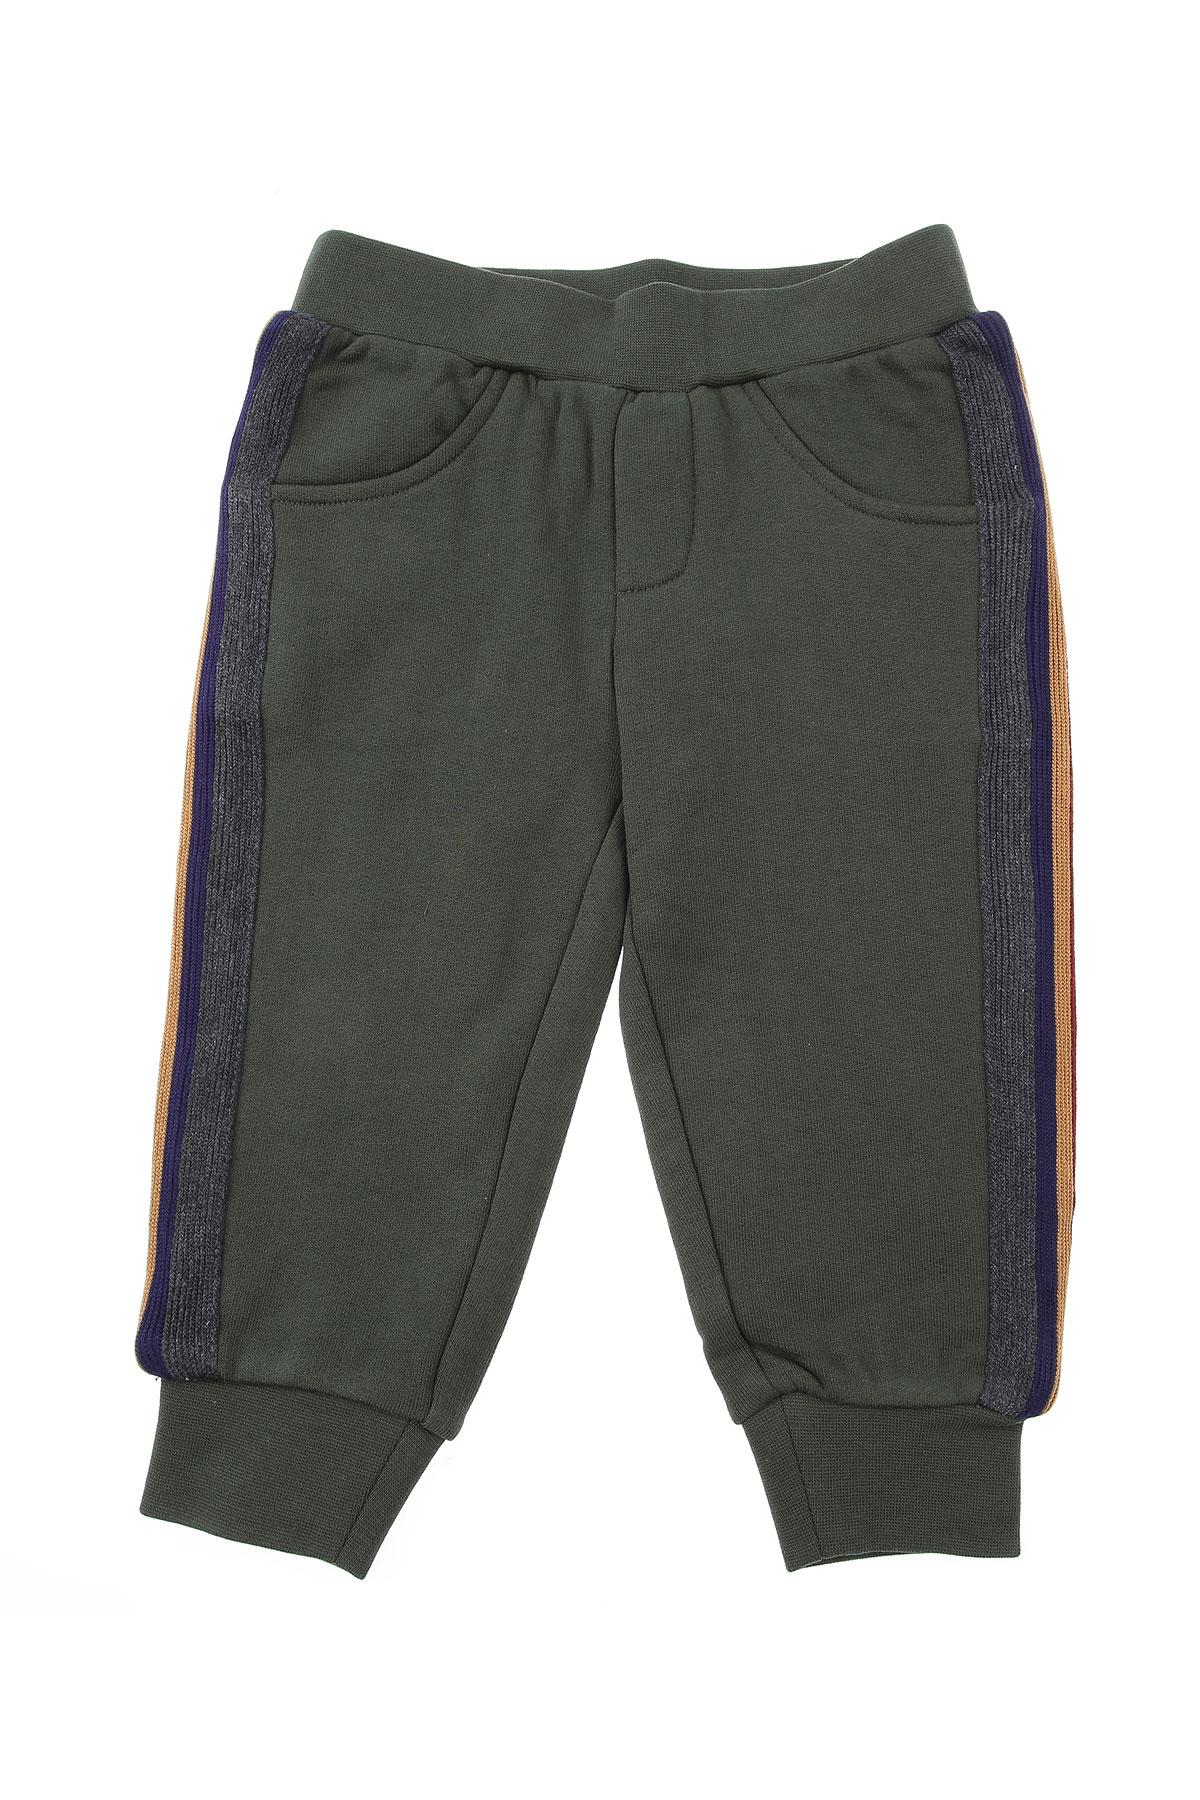 John Richmond Baby Sweatpants for Boys On Sale, Military Green, Cotton, 2019, 12 M 18 M 2Y 3Y 6M 9 M